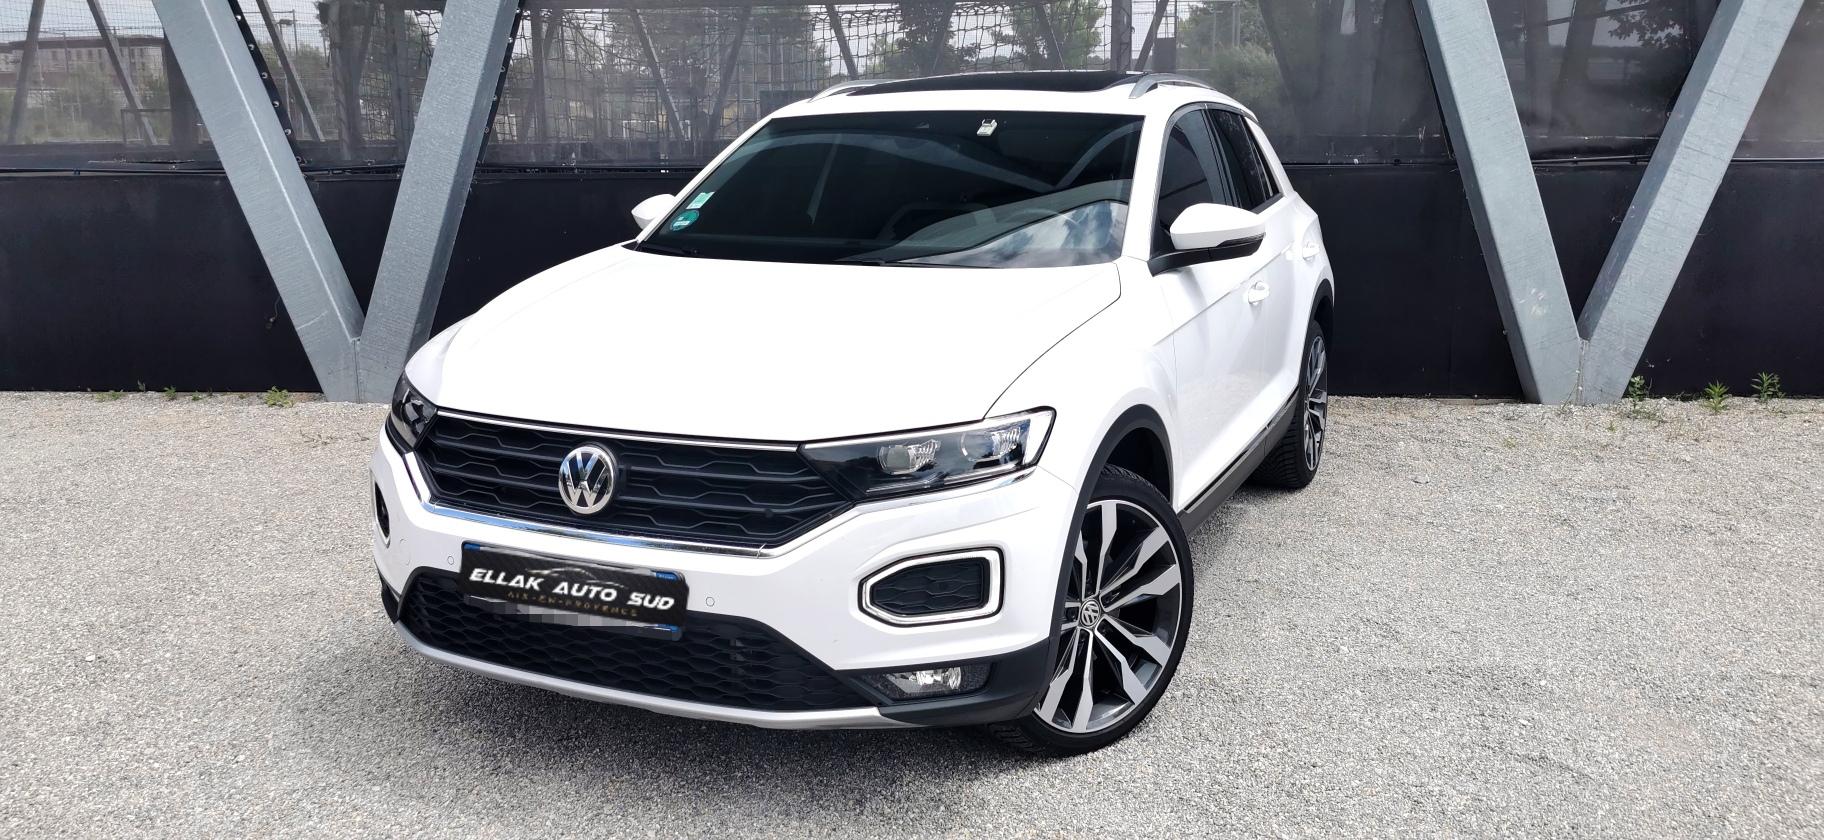 Volkswagen T-Roc - Ellak Auto Sud